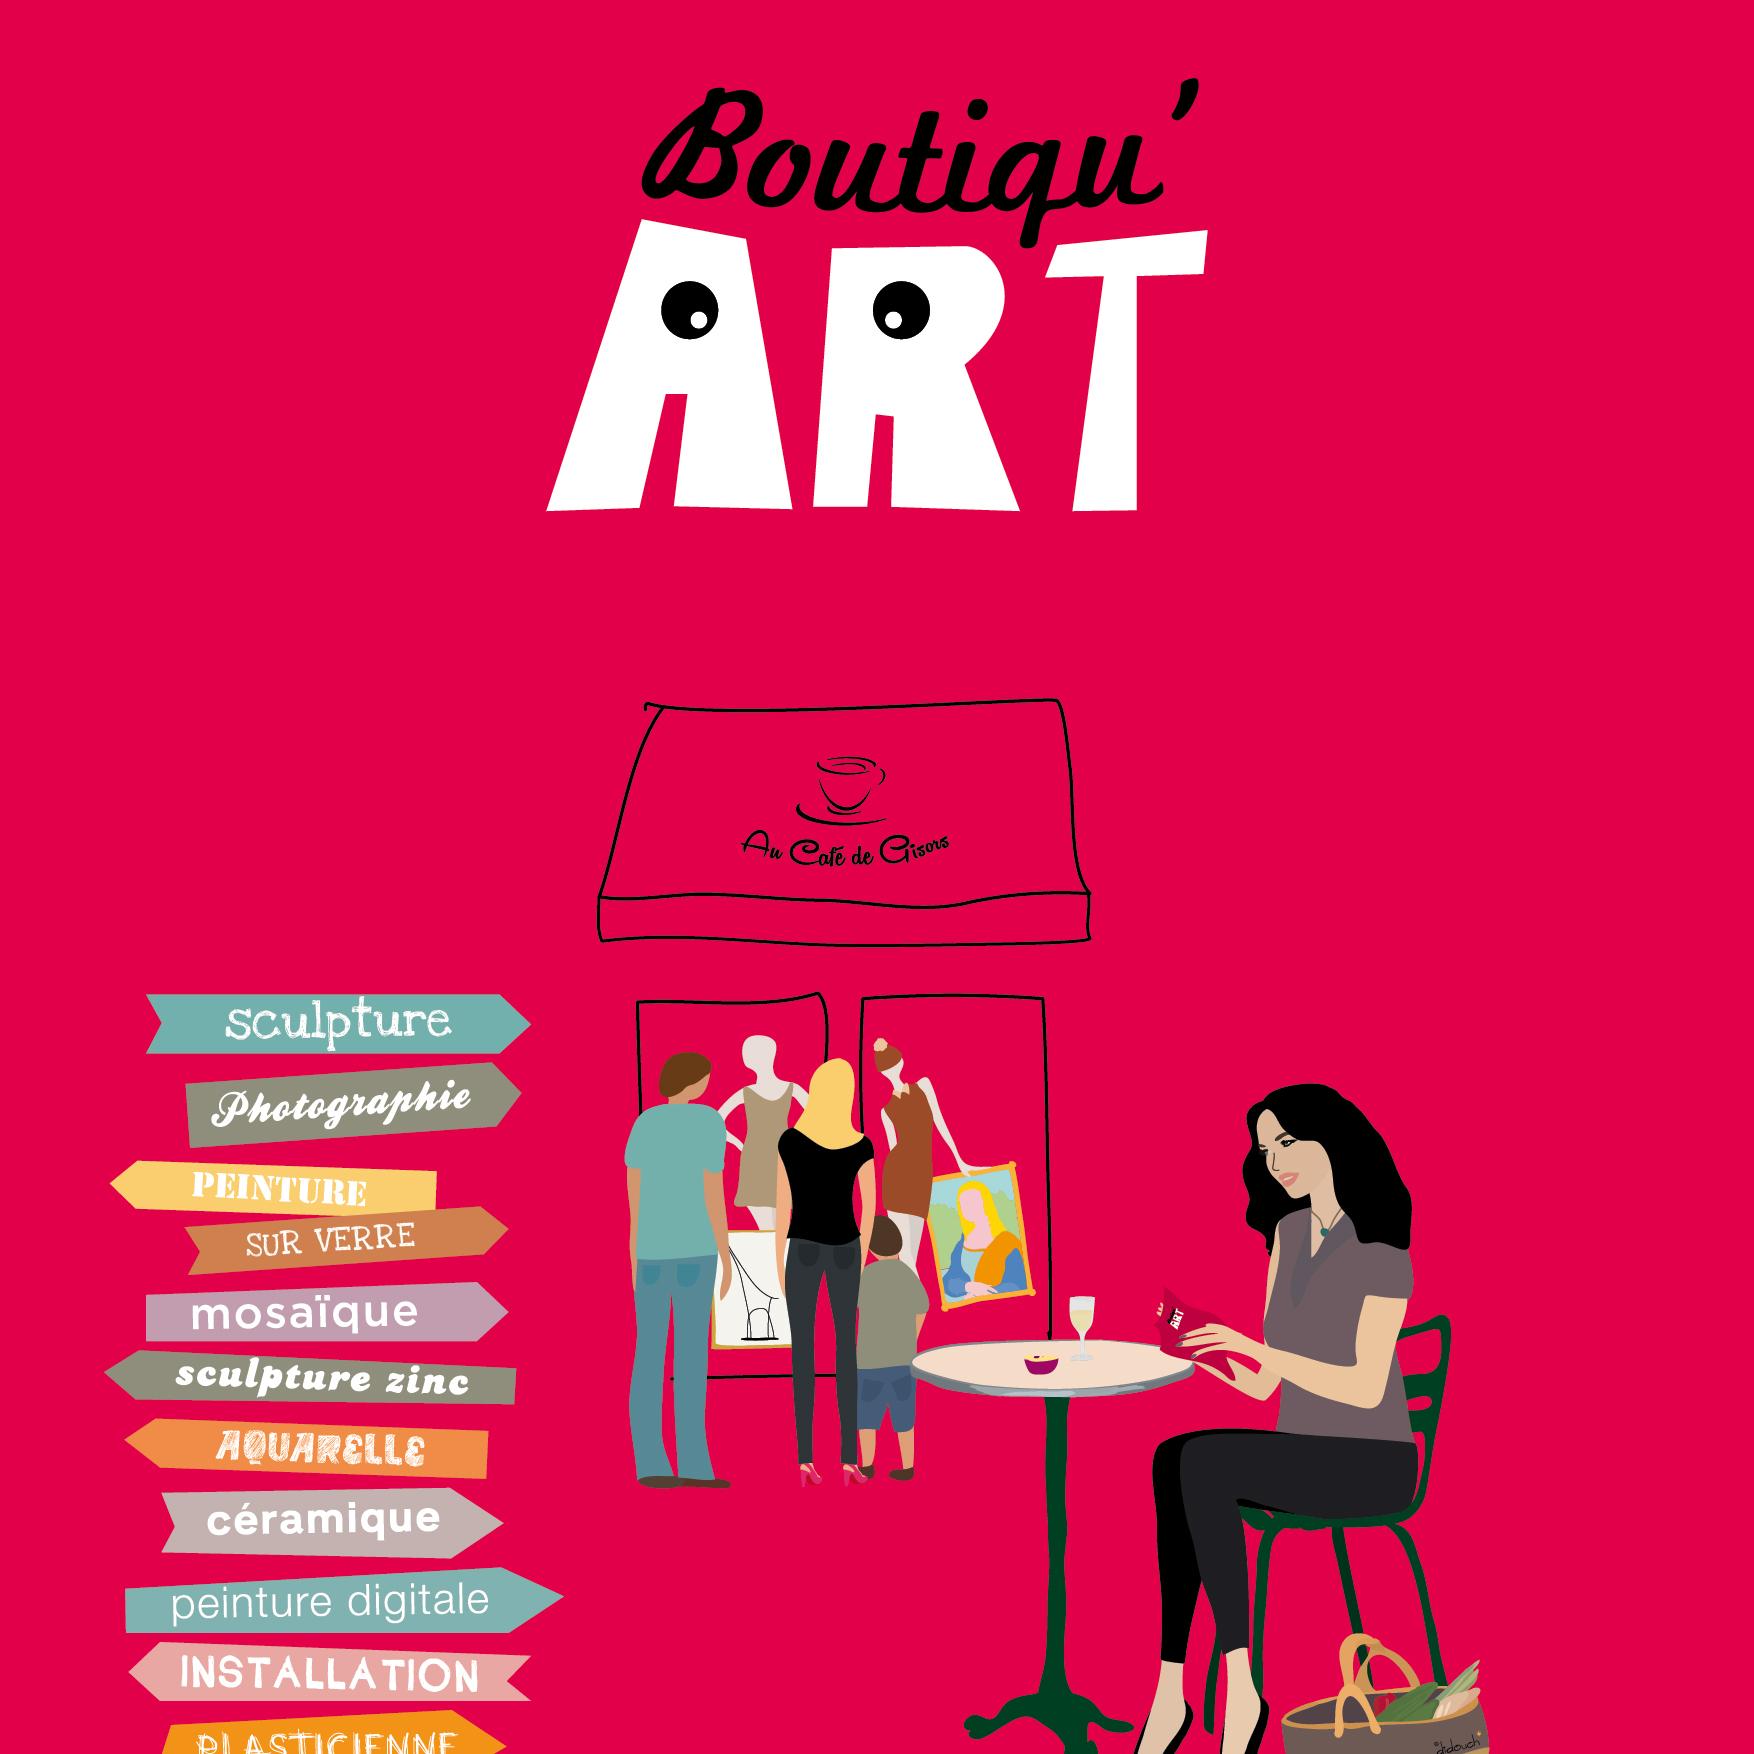 BOUTIQU'ART